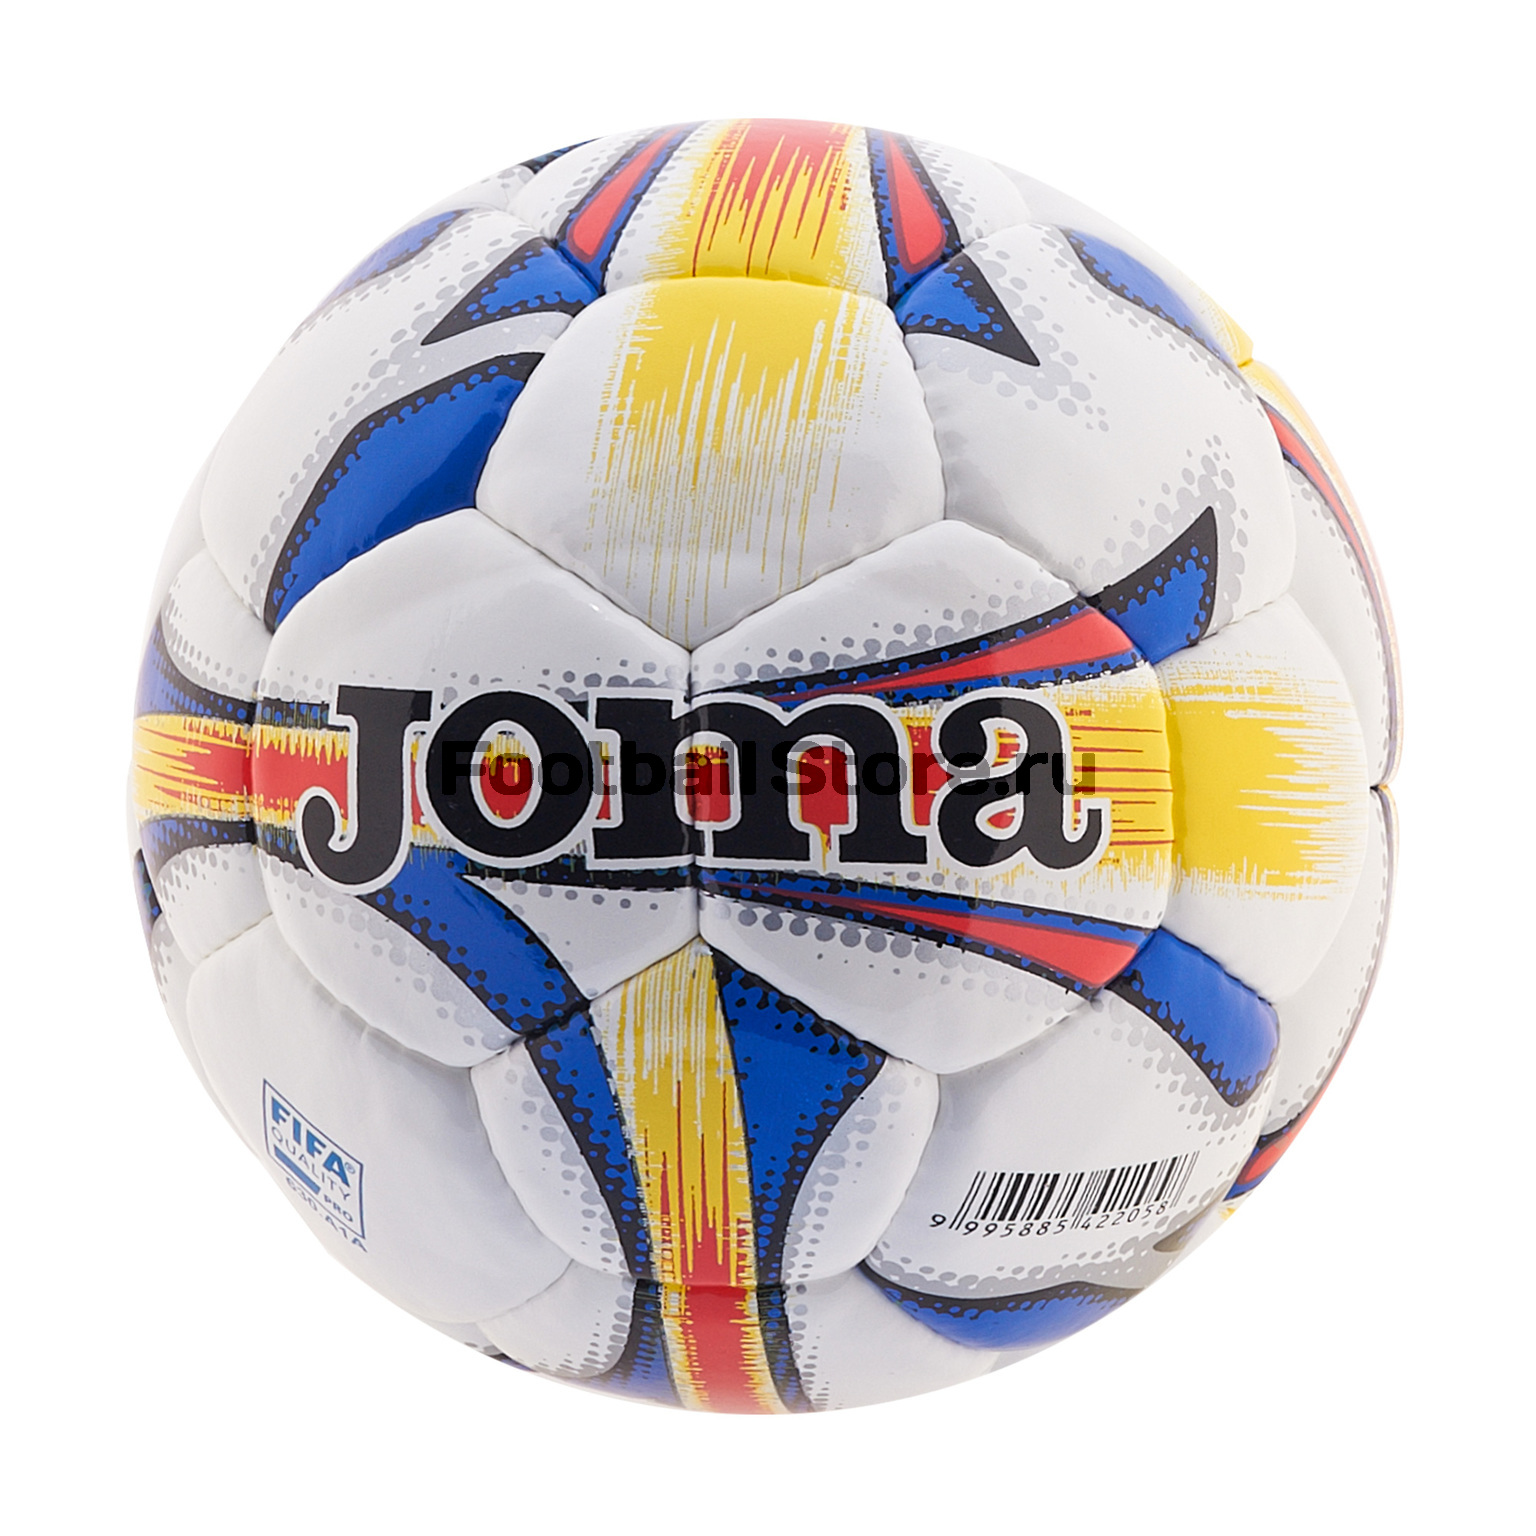 Футзальный мяч Joma Dali Sala 400090.905 мяч футзальный mitre futsal tempest